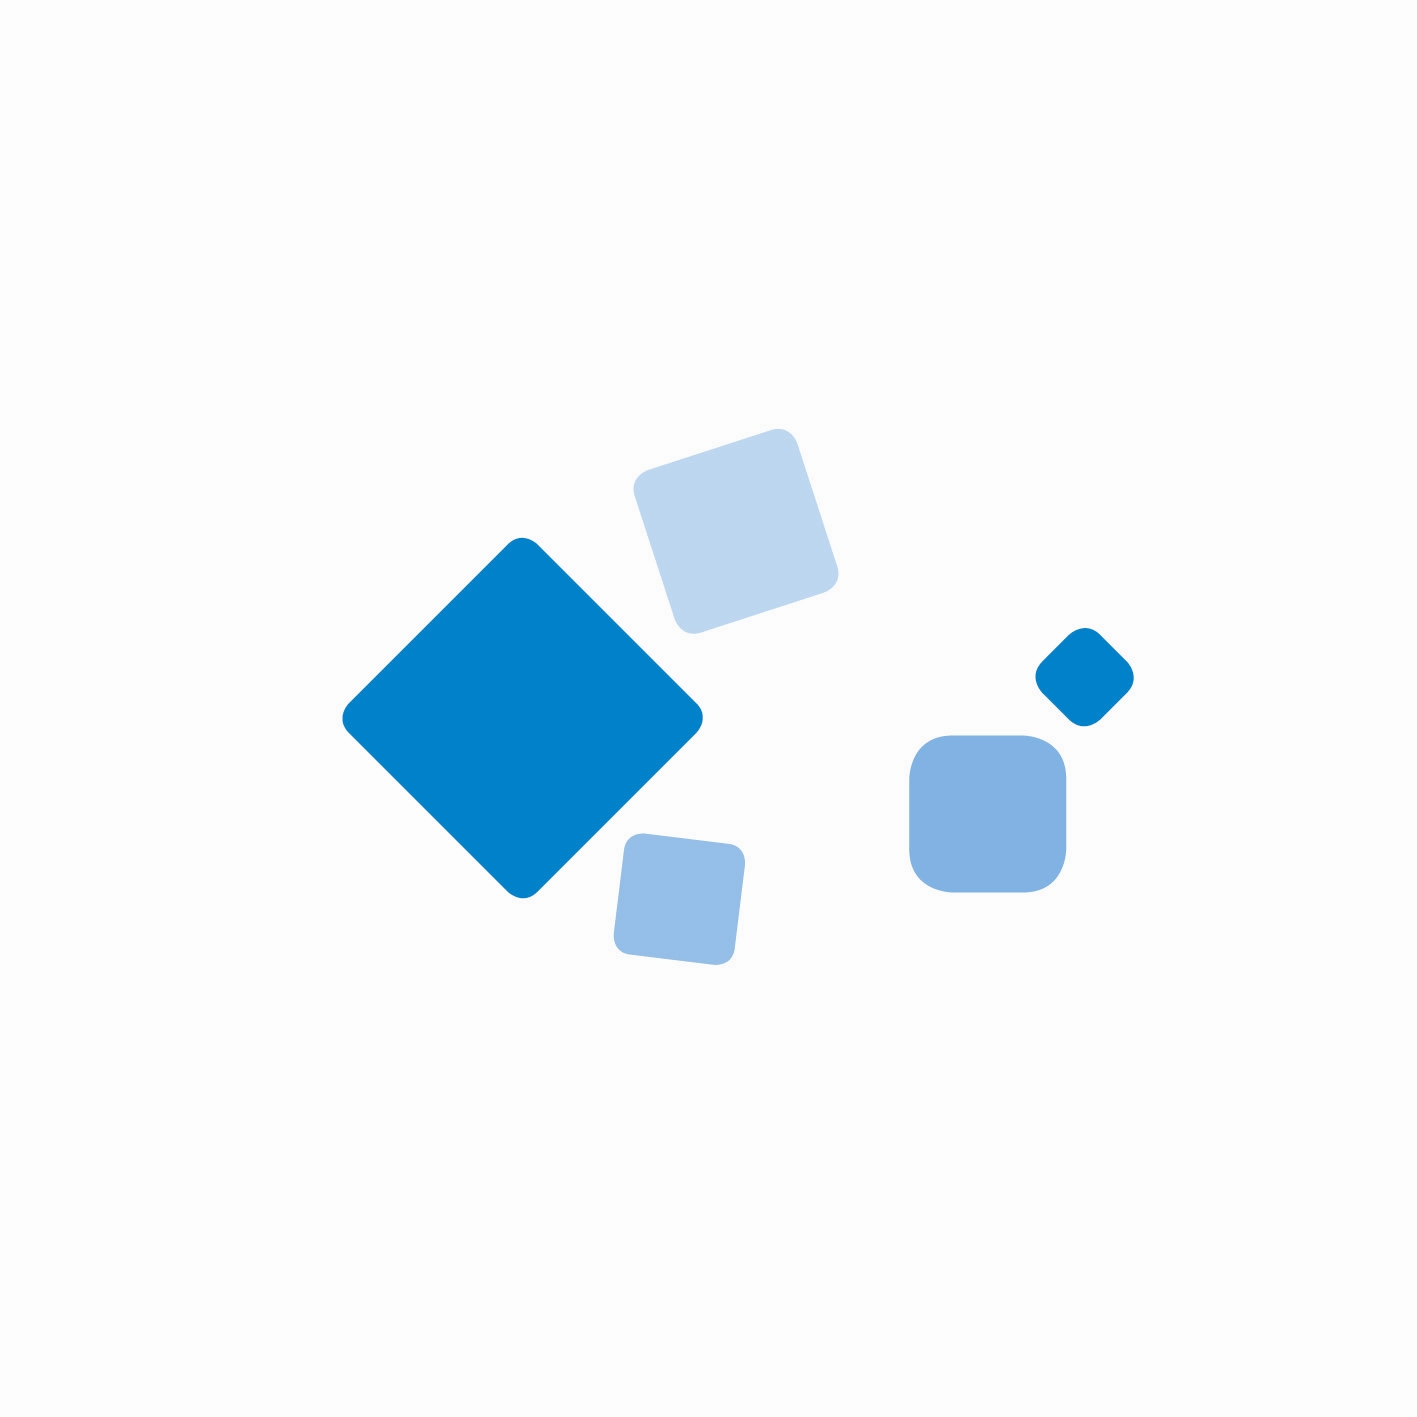 Logo_Wuerfelchen_hellblau